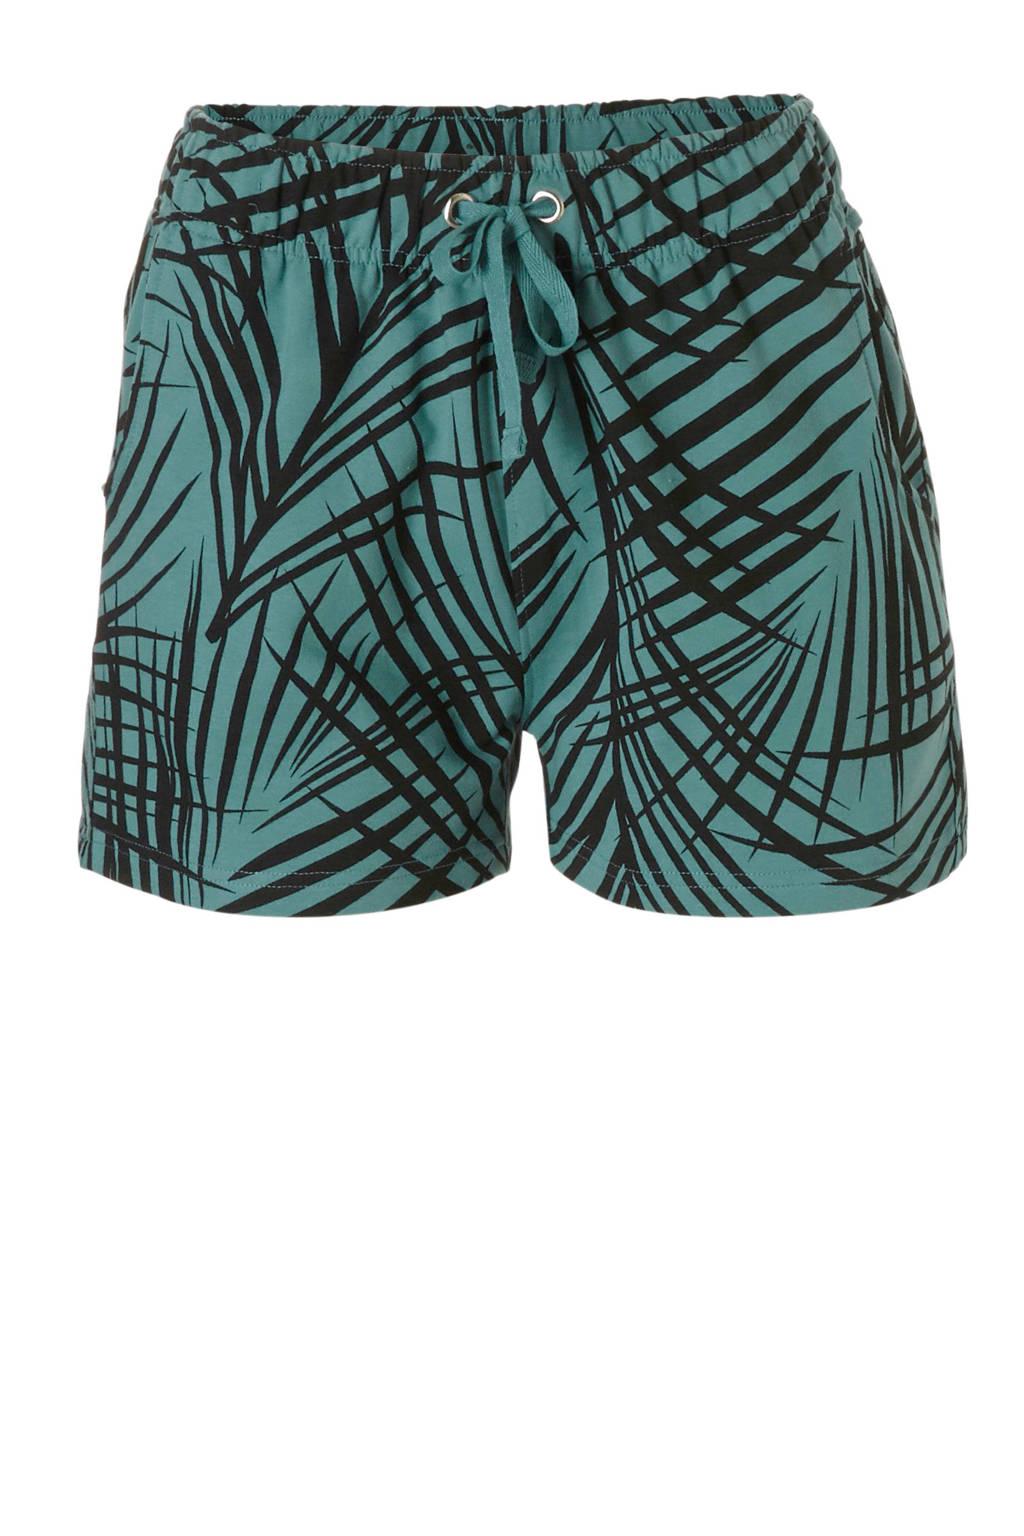 whkmp's beachwave sweat short met bladprint, Turquoise/zwart